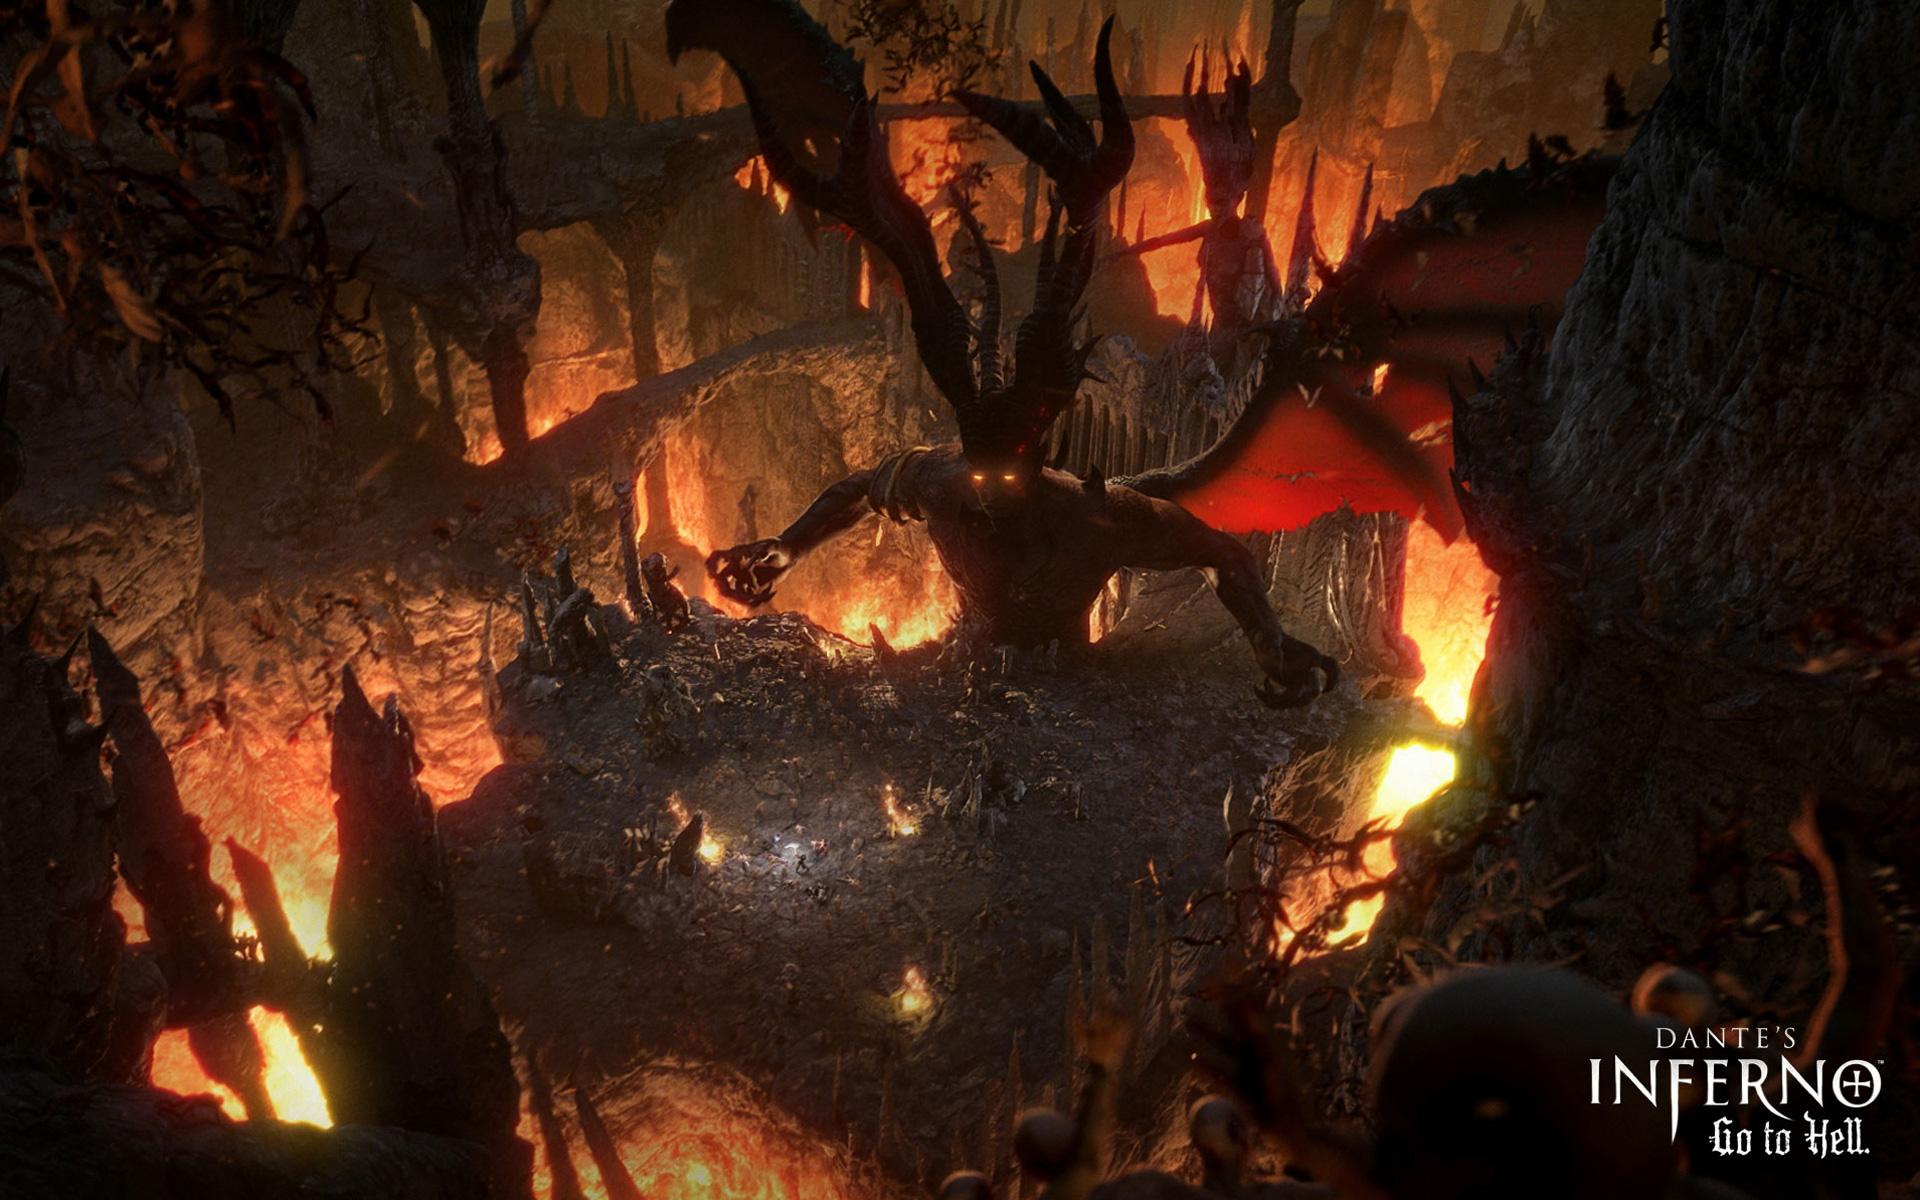 dantes inferno hell awaits wallpaper Xbox Video Game Wallpaper Game 1920x1200